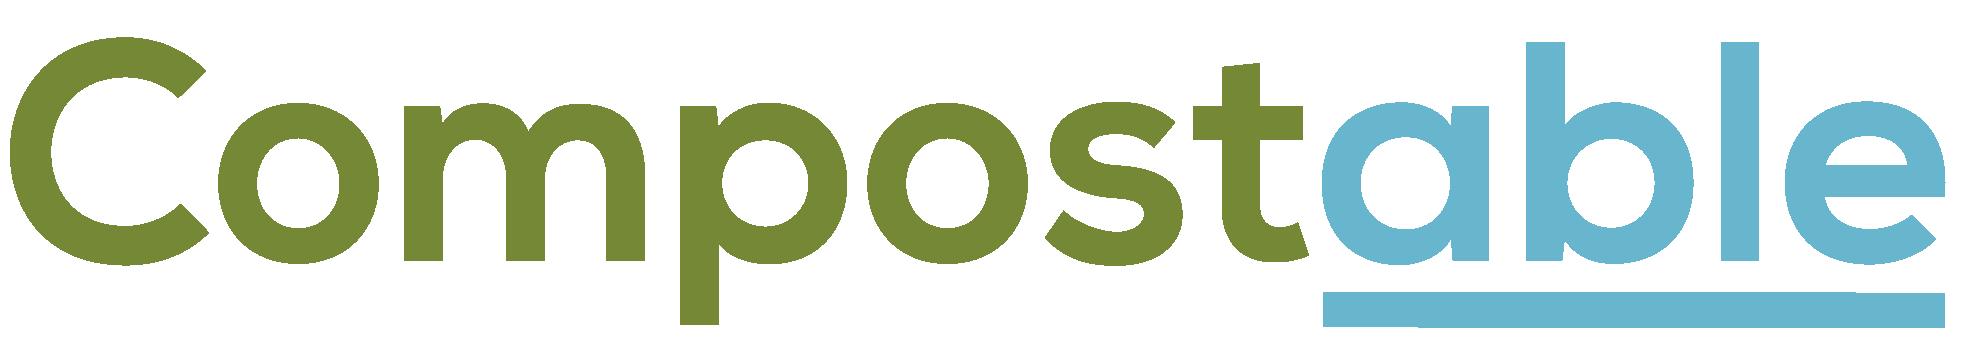 Compostable Wordmark logo